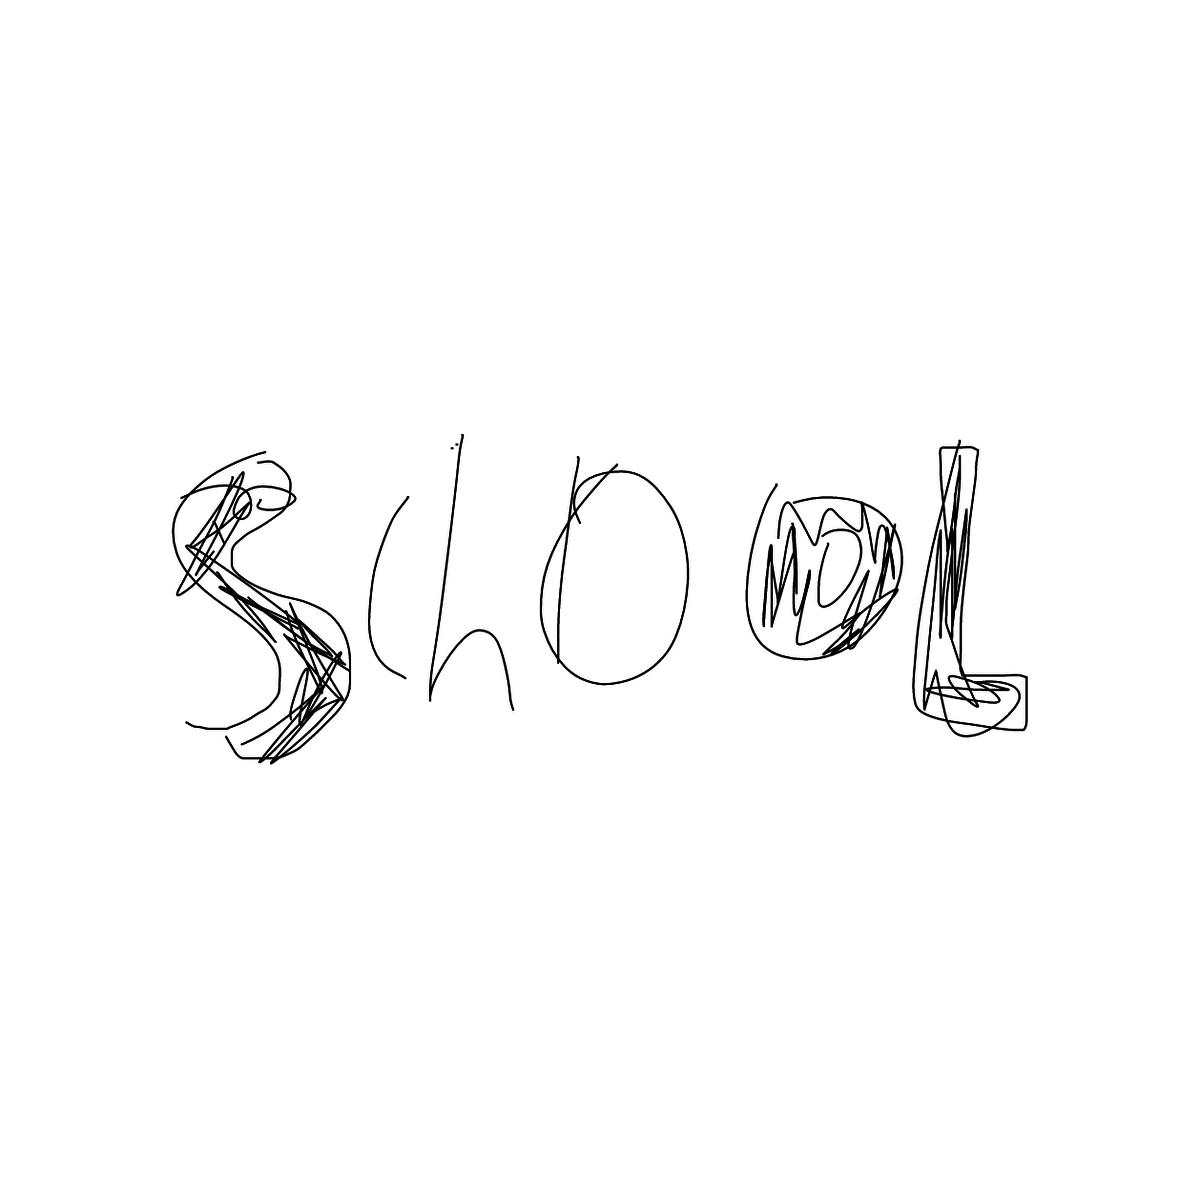 BAAAM drawing#22336 lat:40.5967178344726560lng: -73.9483718872070300